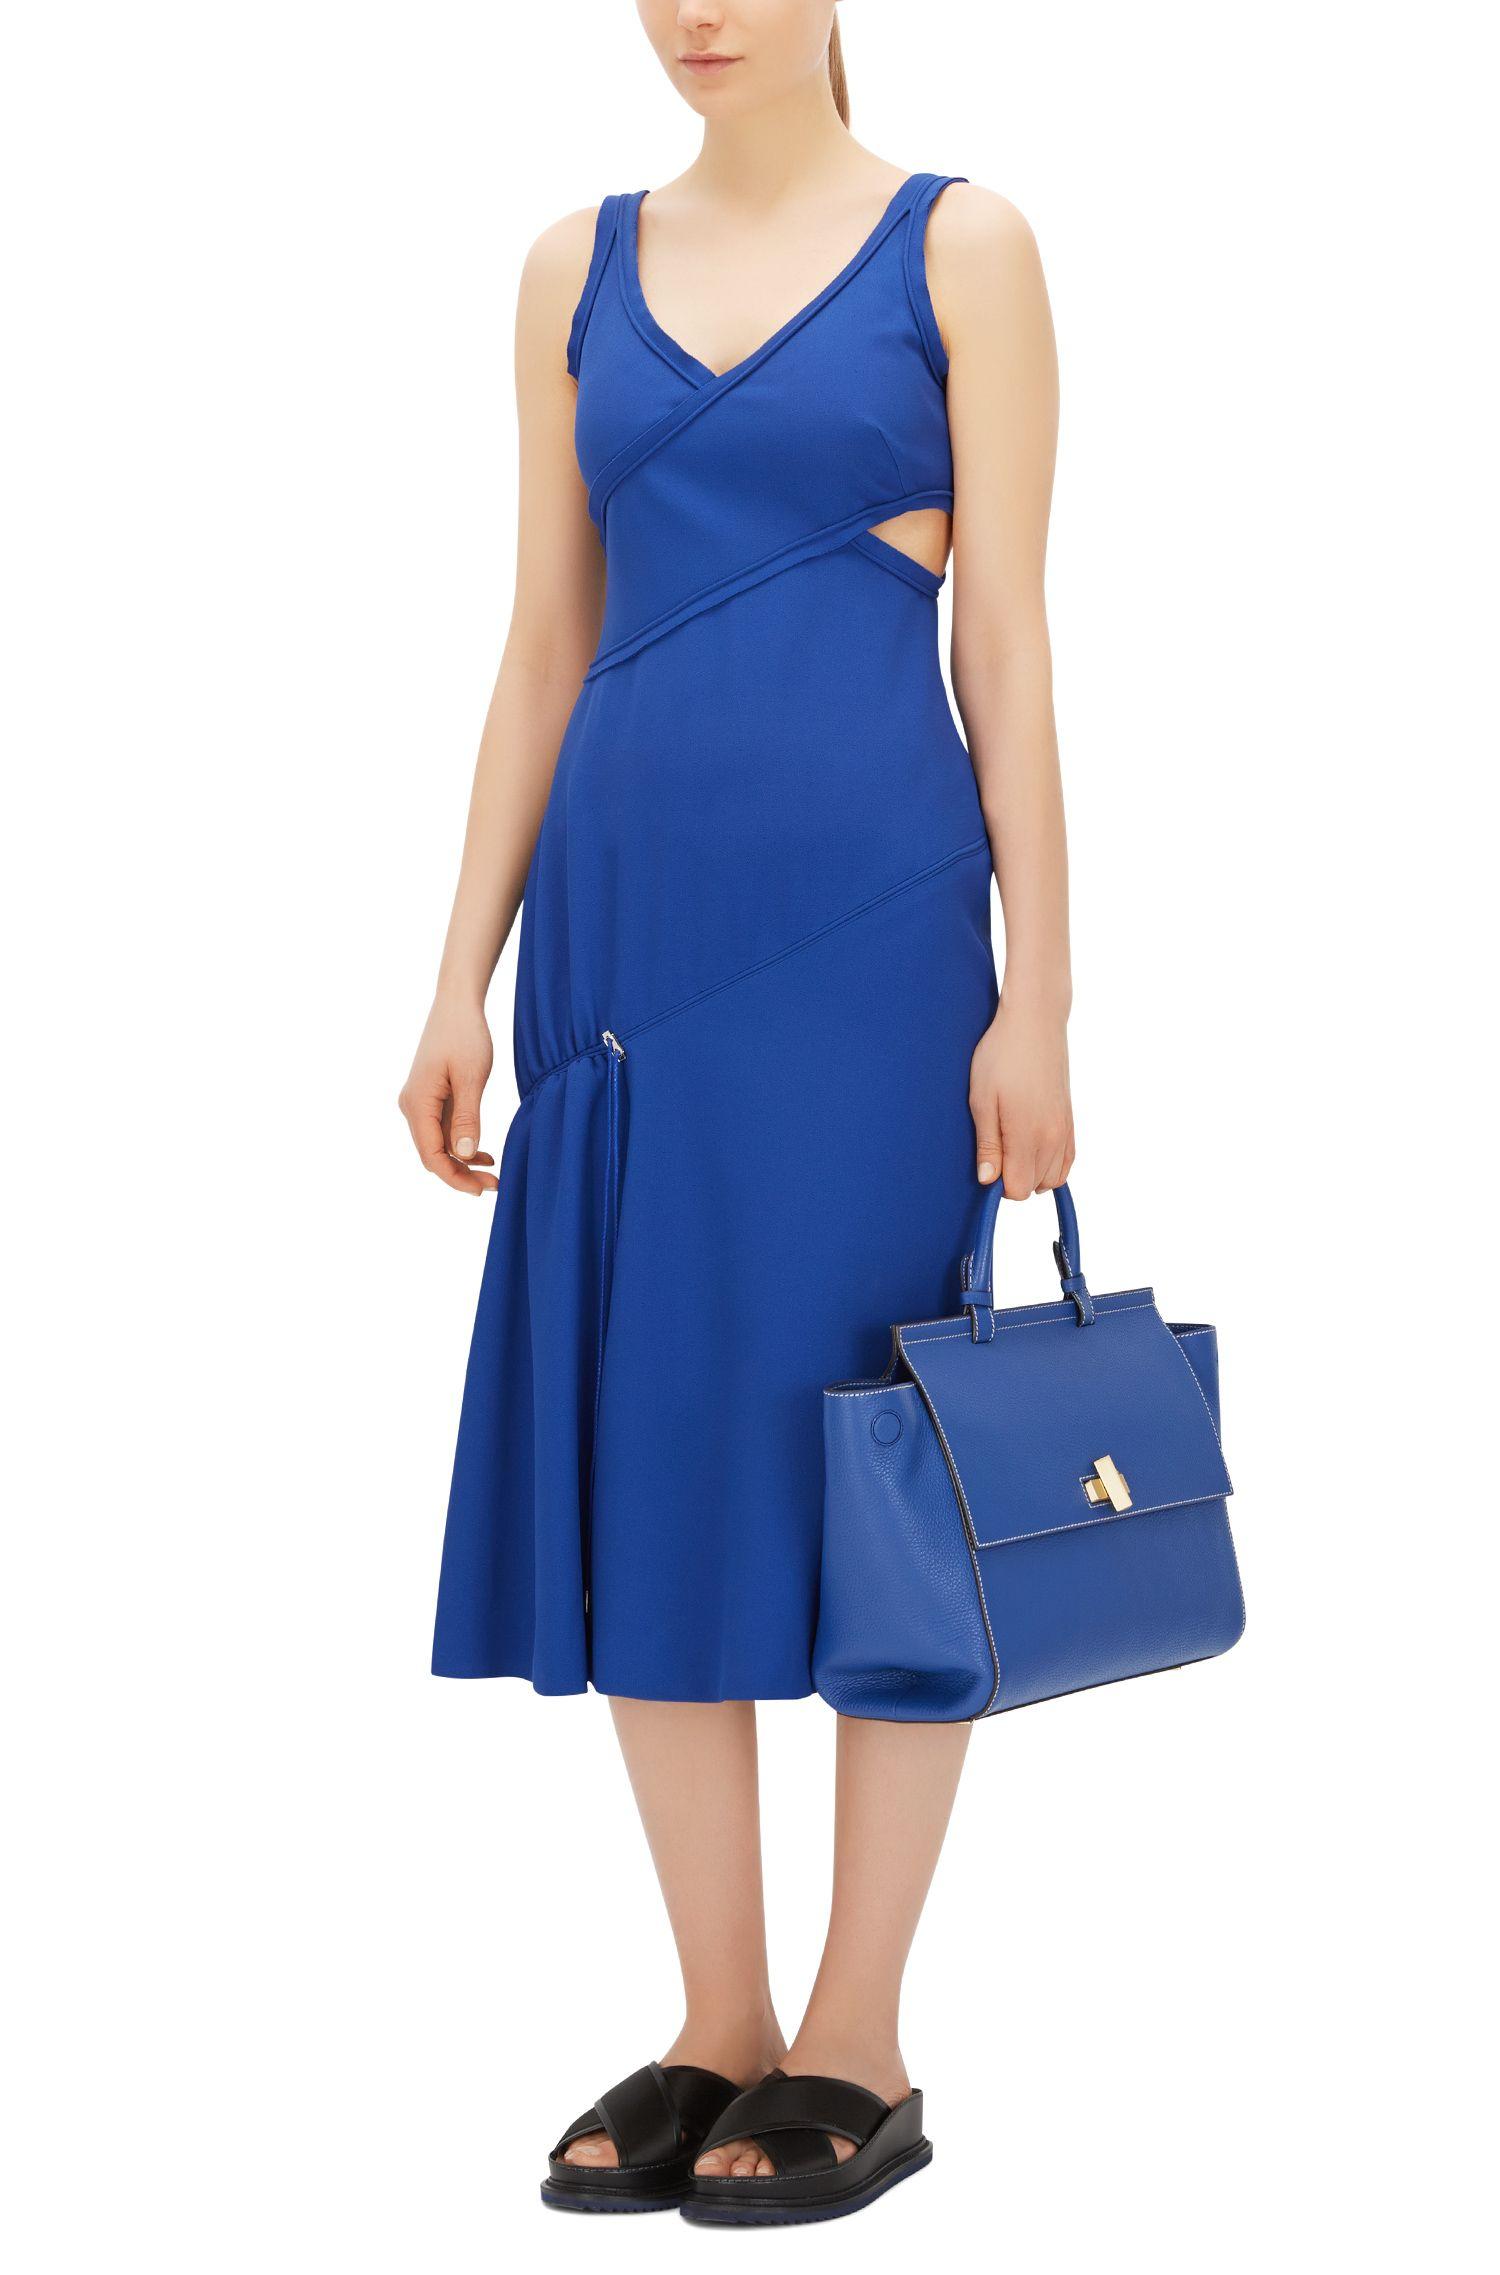 'BOSS Bespoke Soft M' | Leather Grained Satchel Handbag, Light Blue